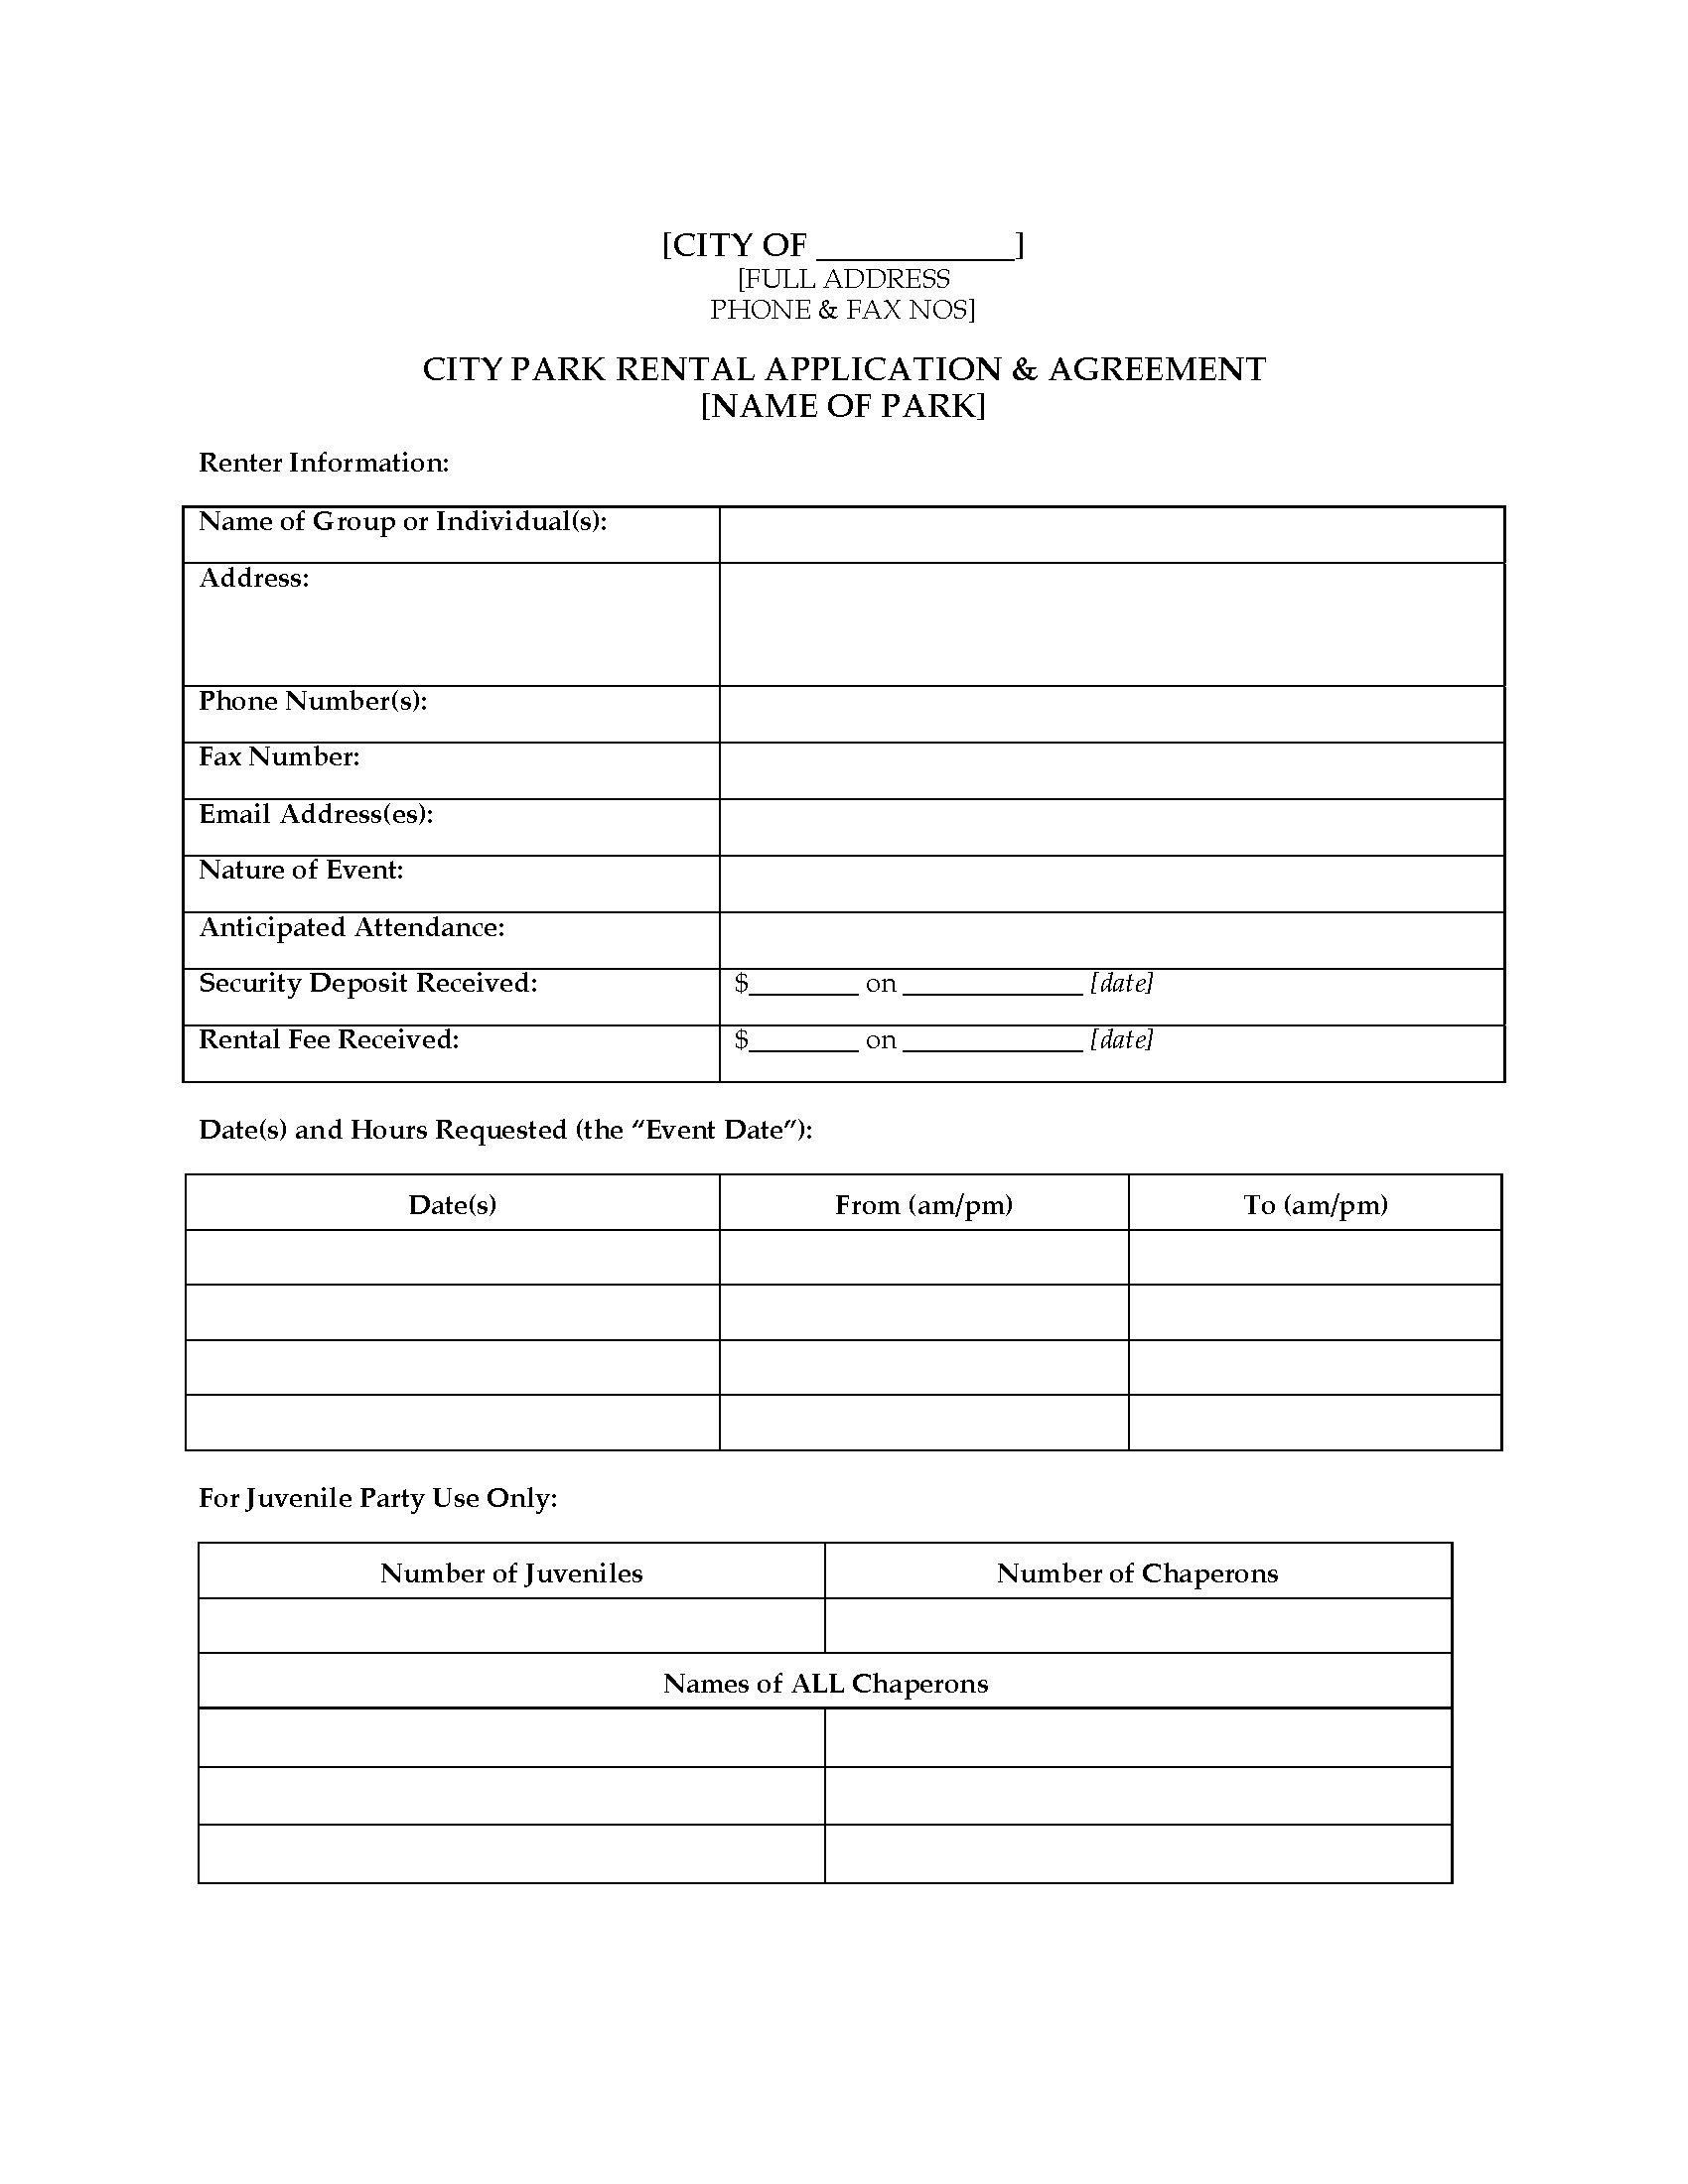 Rental Agreement Template New Zealand – Rental Agreements Template